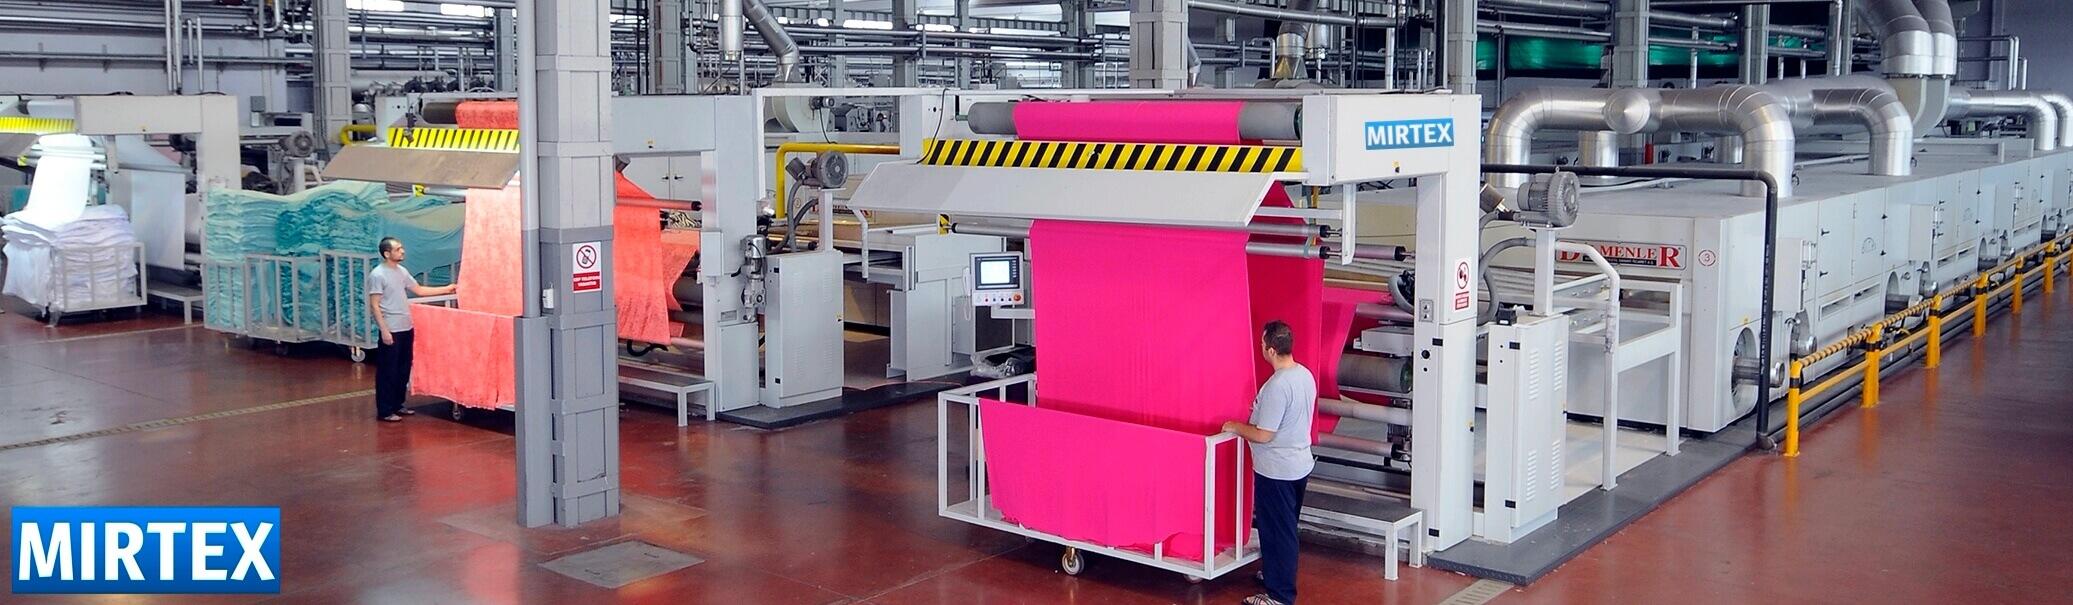 mirtex-fabrika